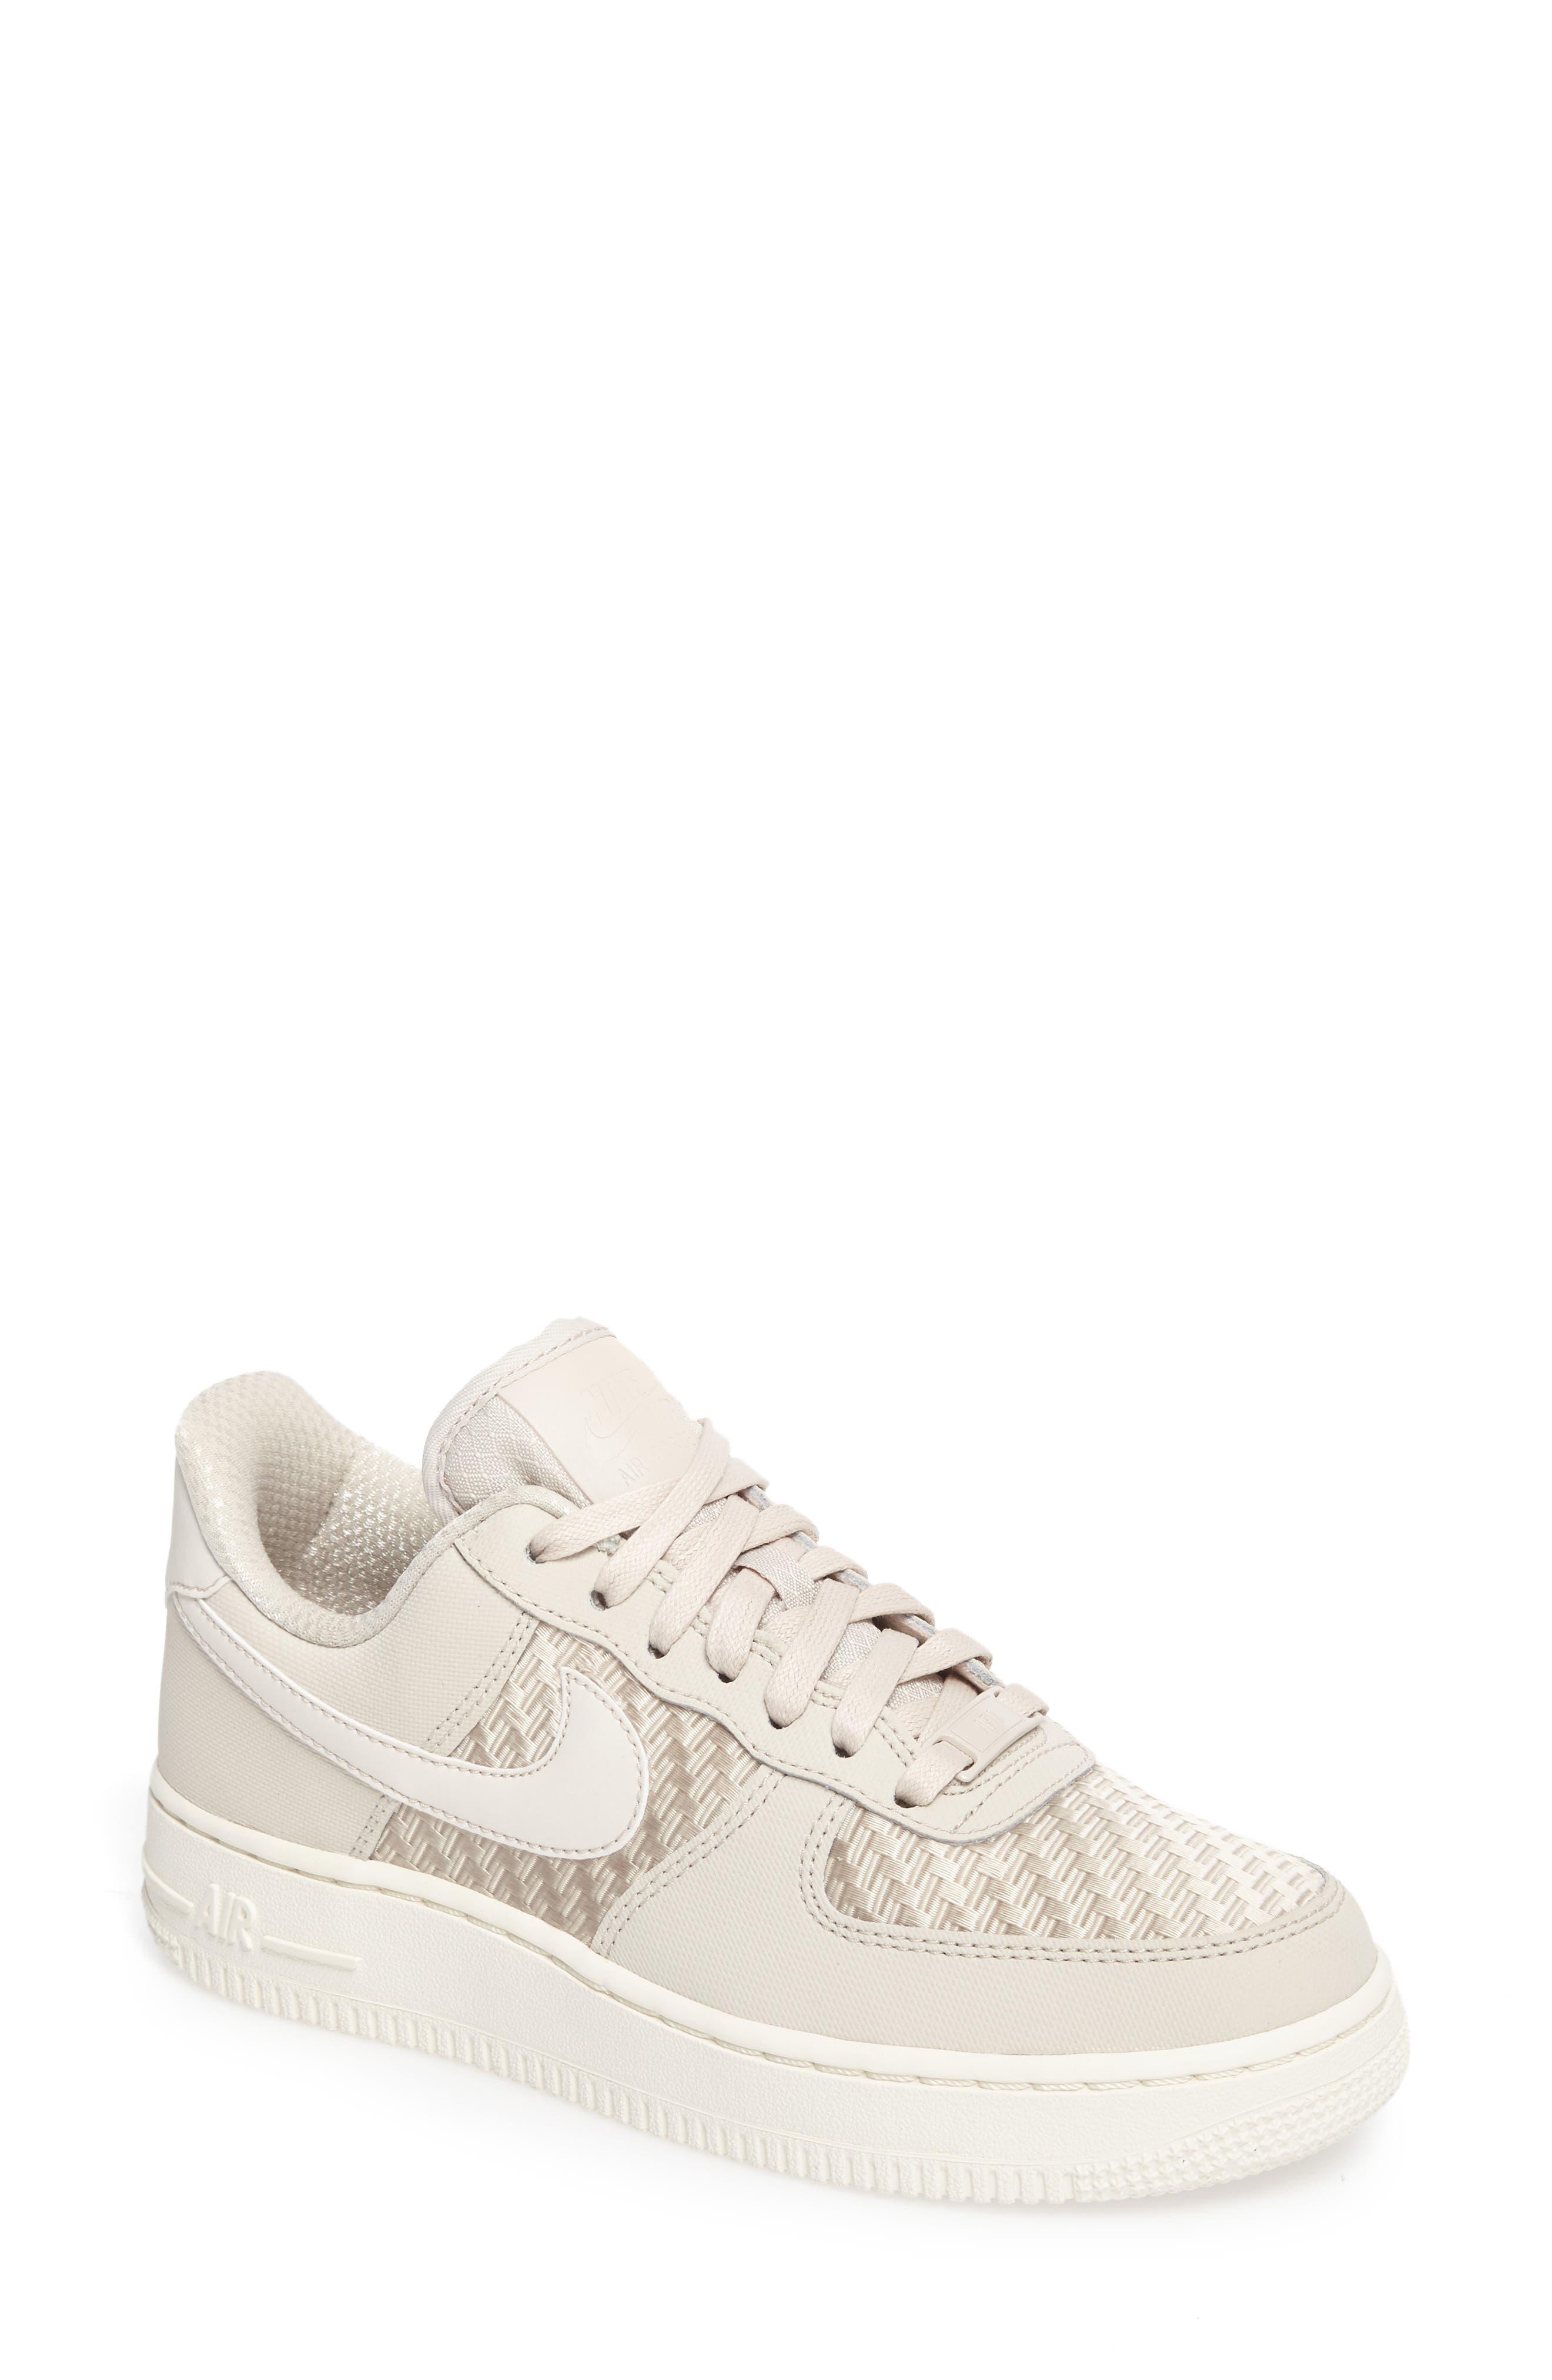 Air Force 1 '07 Pinnacle Sneaker,                         Main,                         color, DESERT SAND/ DESERT SAND